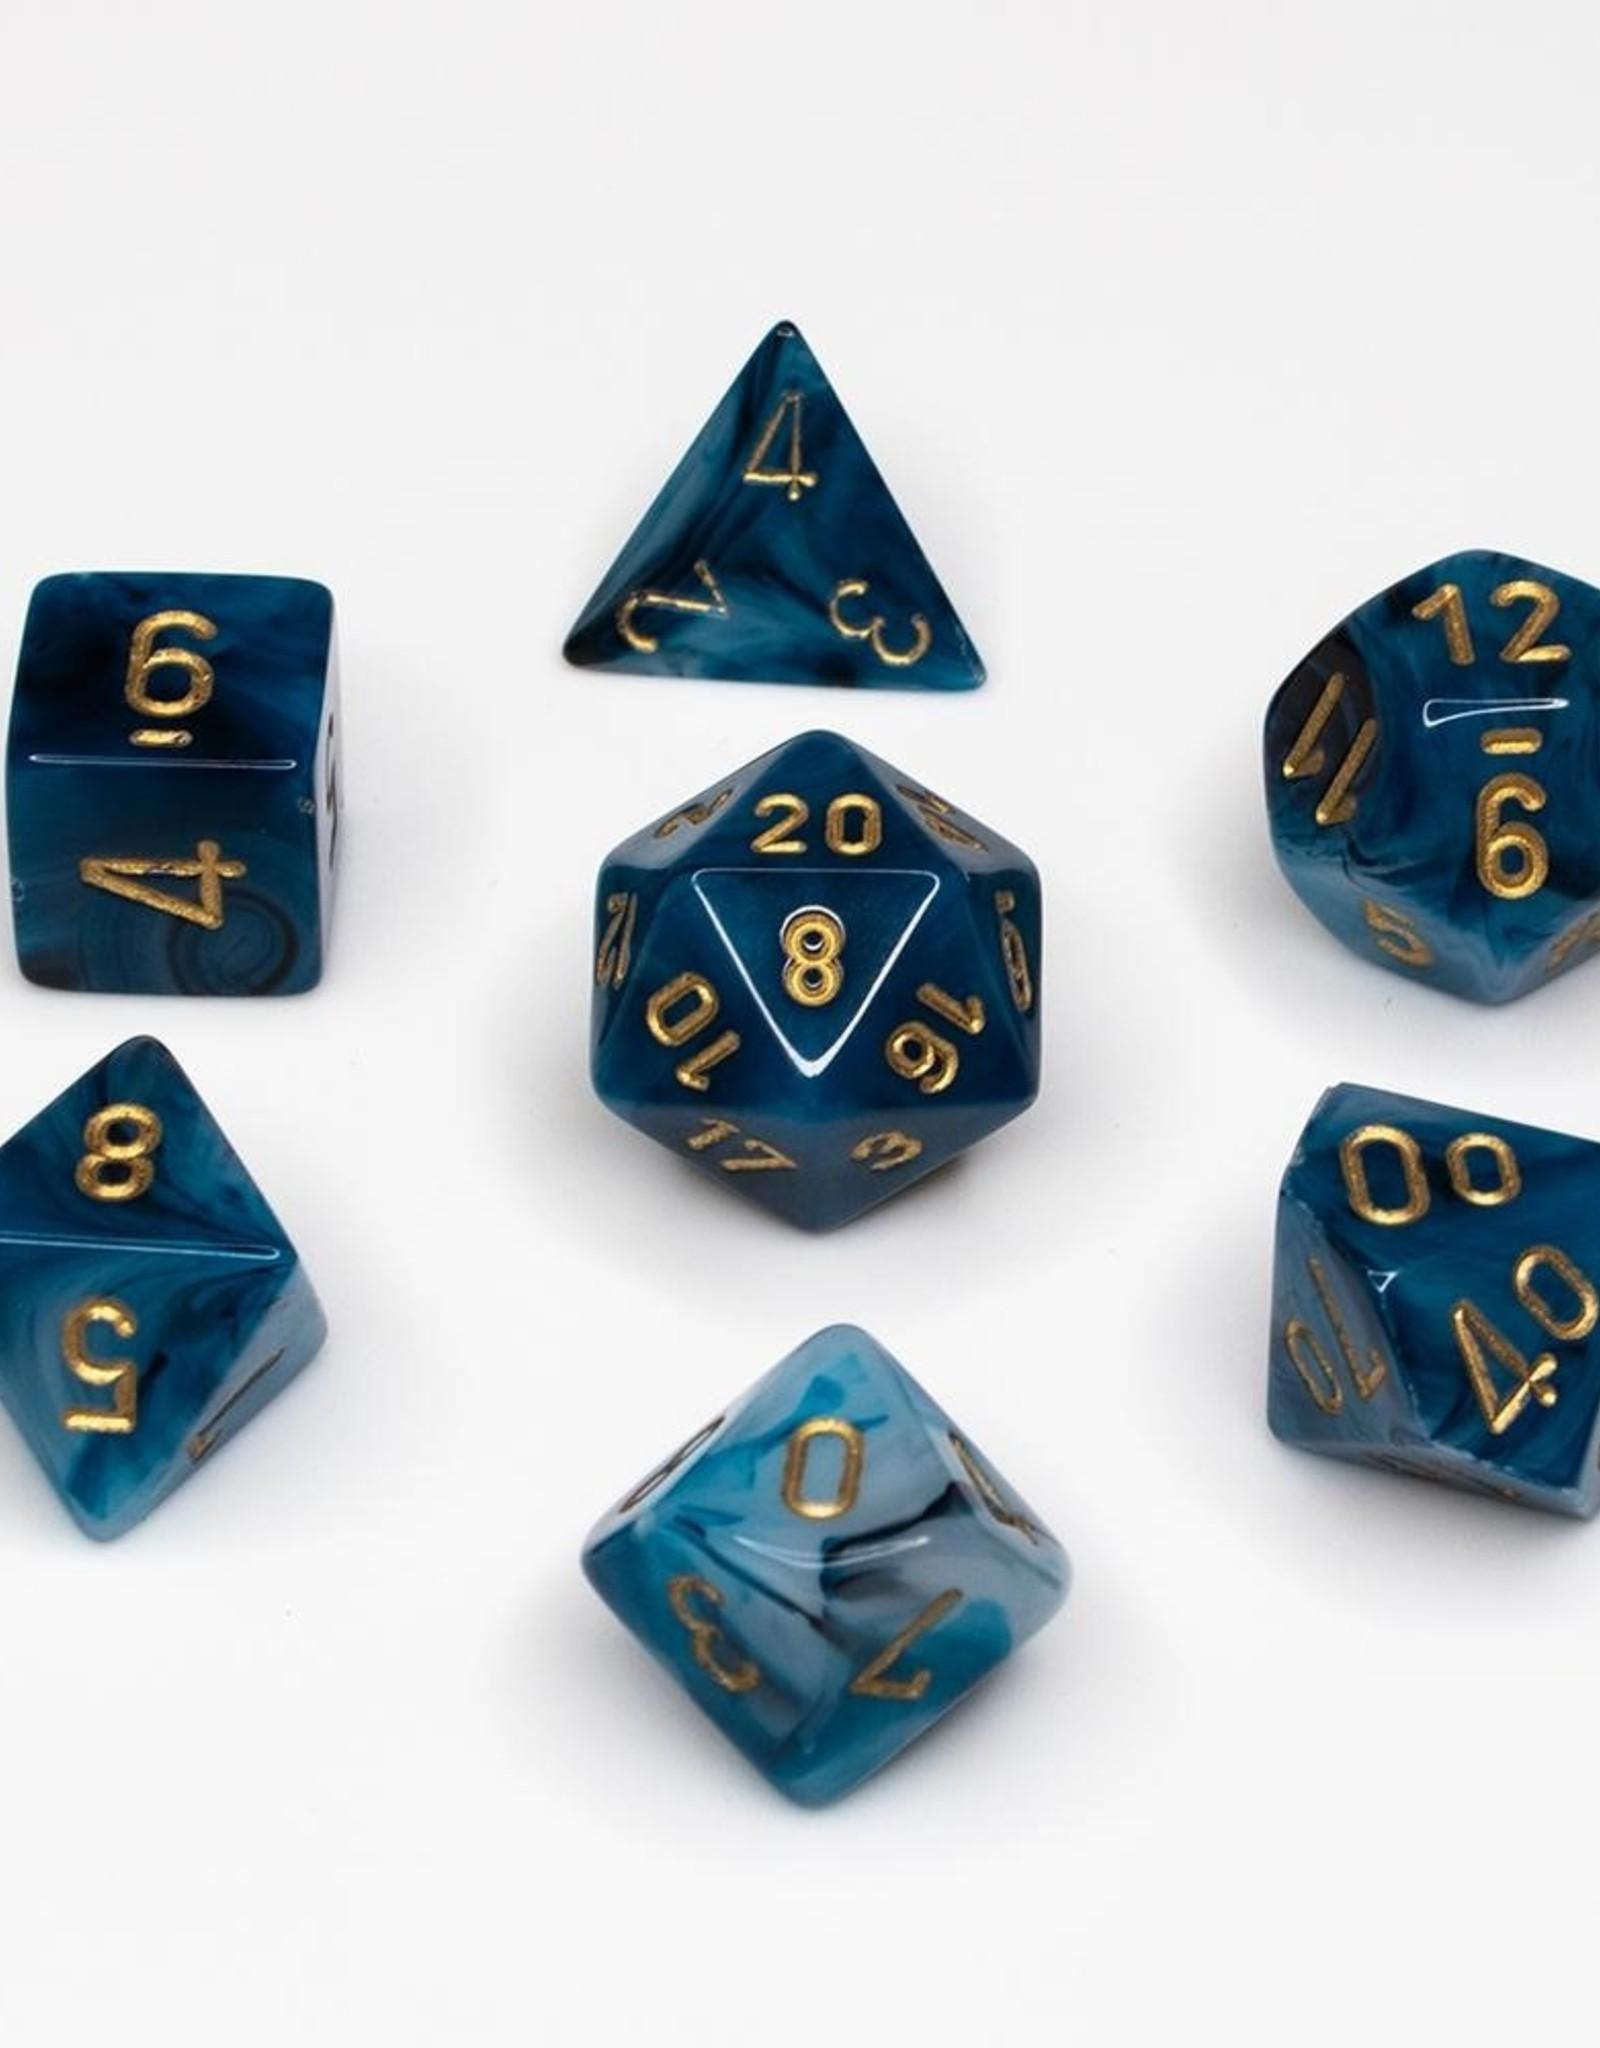 Chessex Chessex 7-Die set Phantom - Teal/Gold